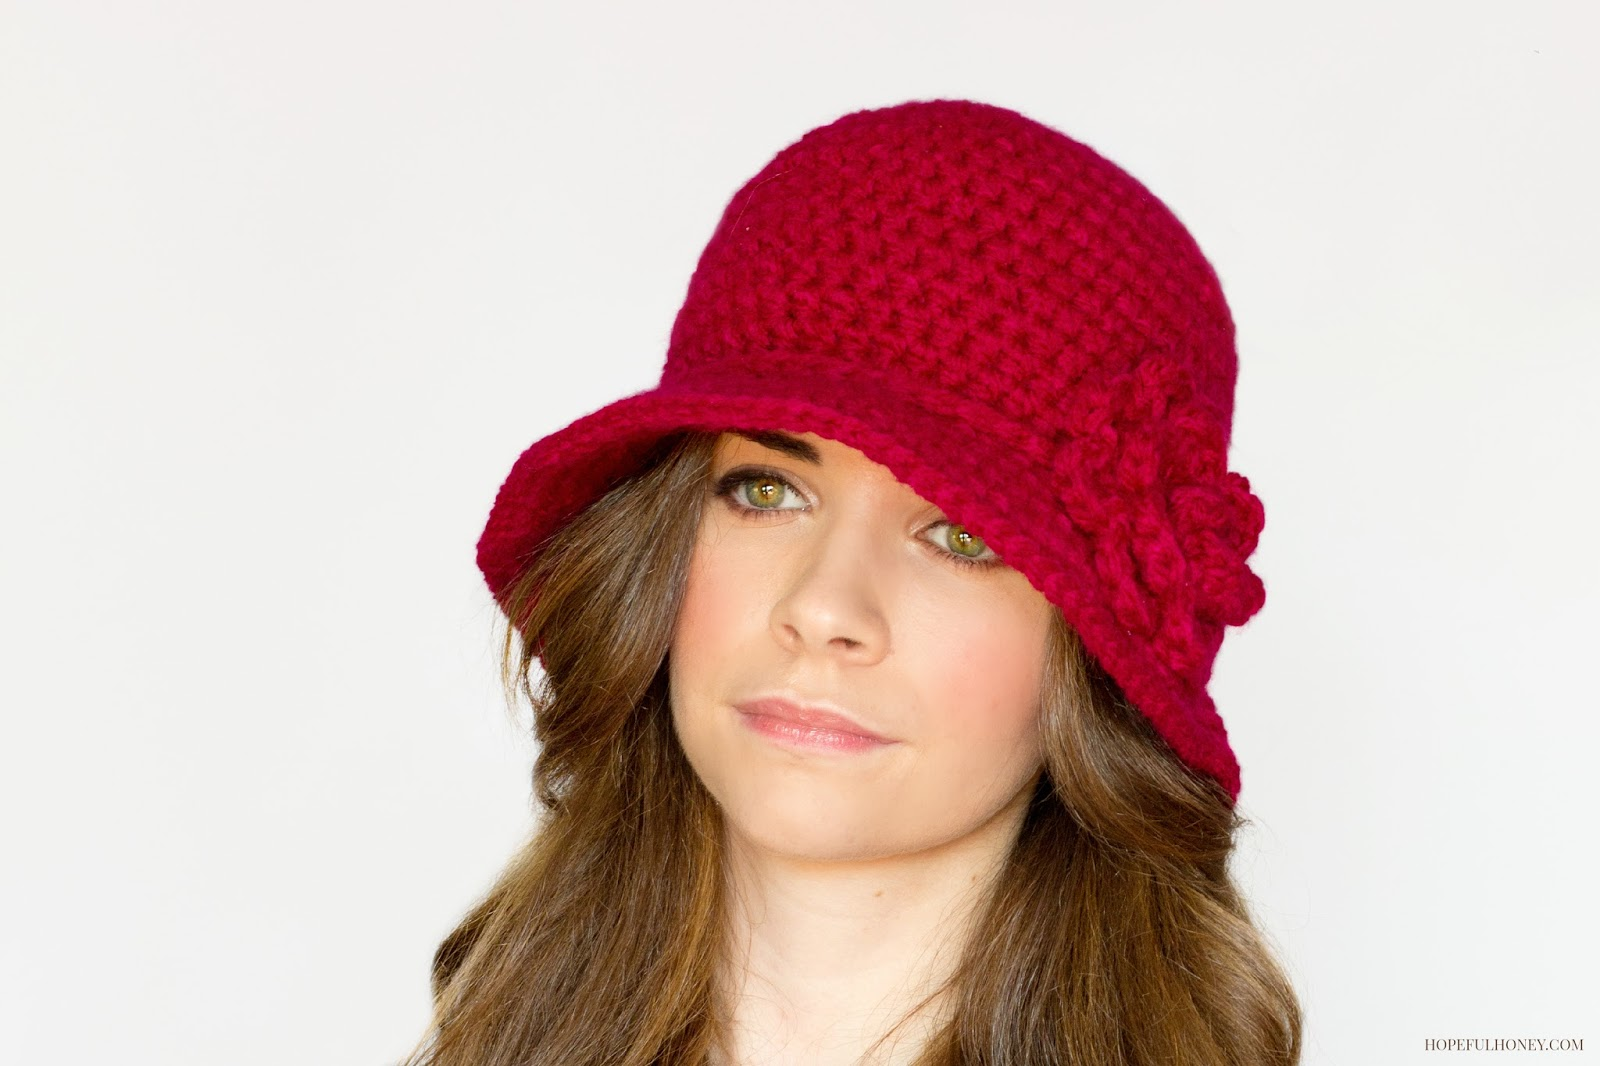 Hopeful Honey Craft Crochet Create 1920 S Cloche Hat